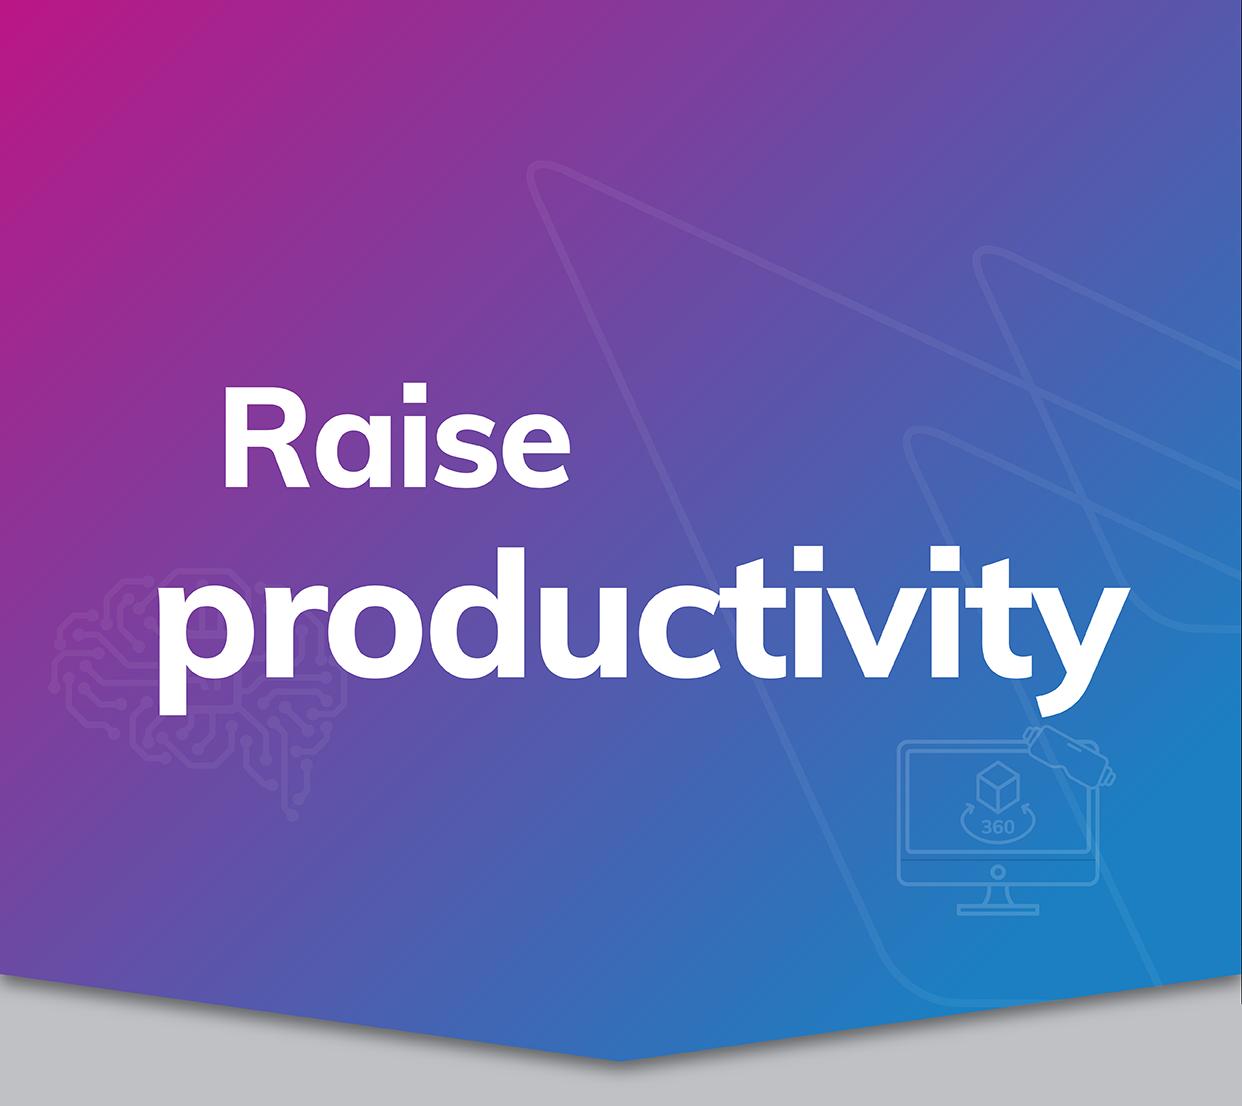 raise productivity